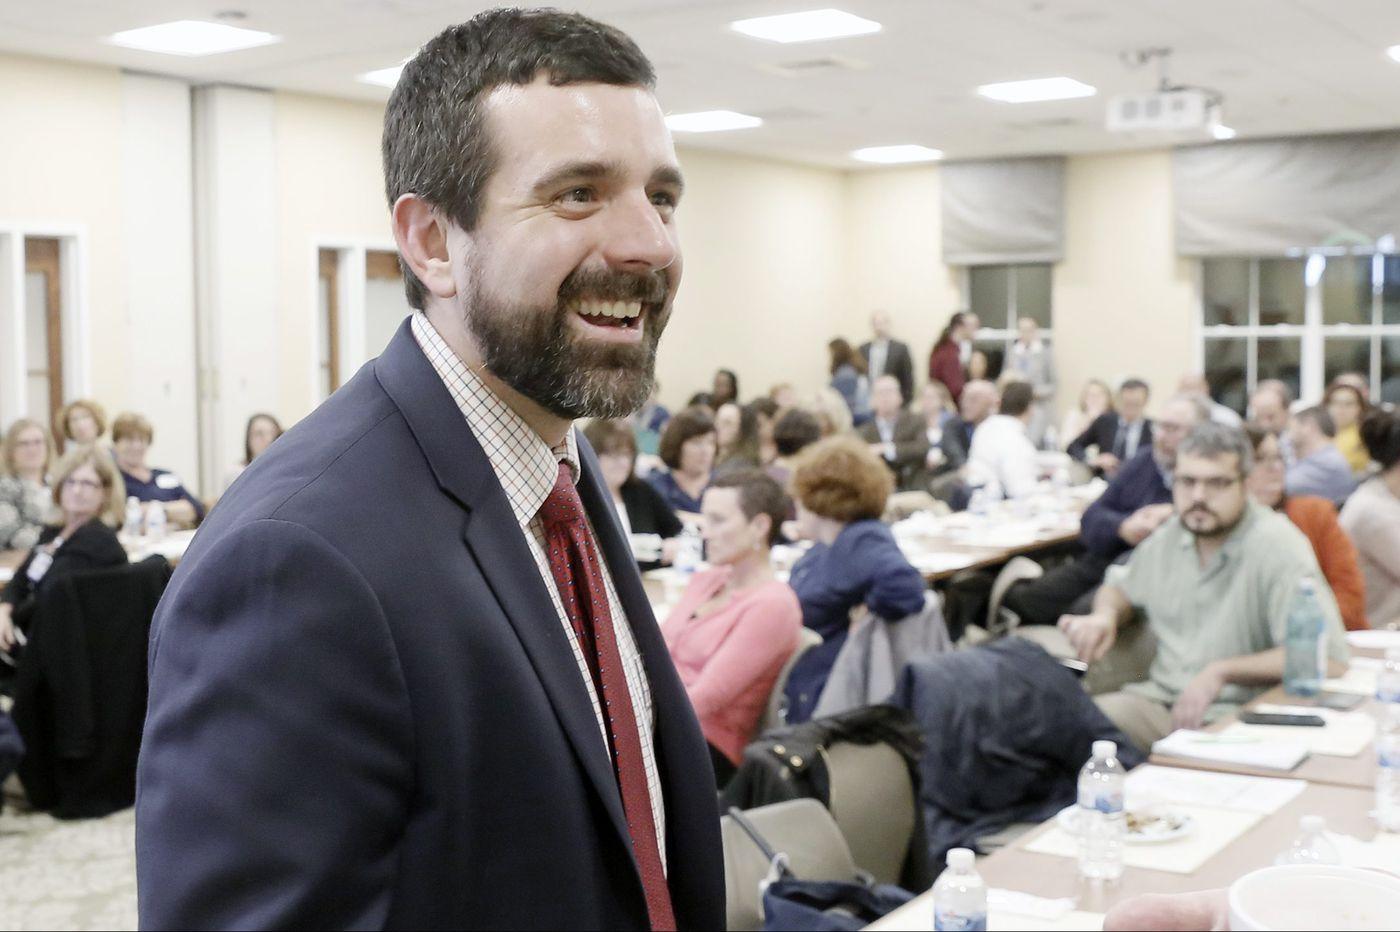 New Jersey's medical-marijuana program hits the road to win over doctors